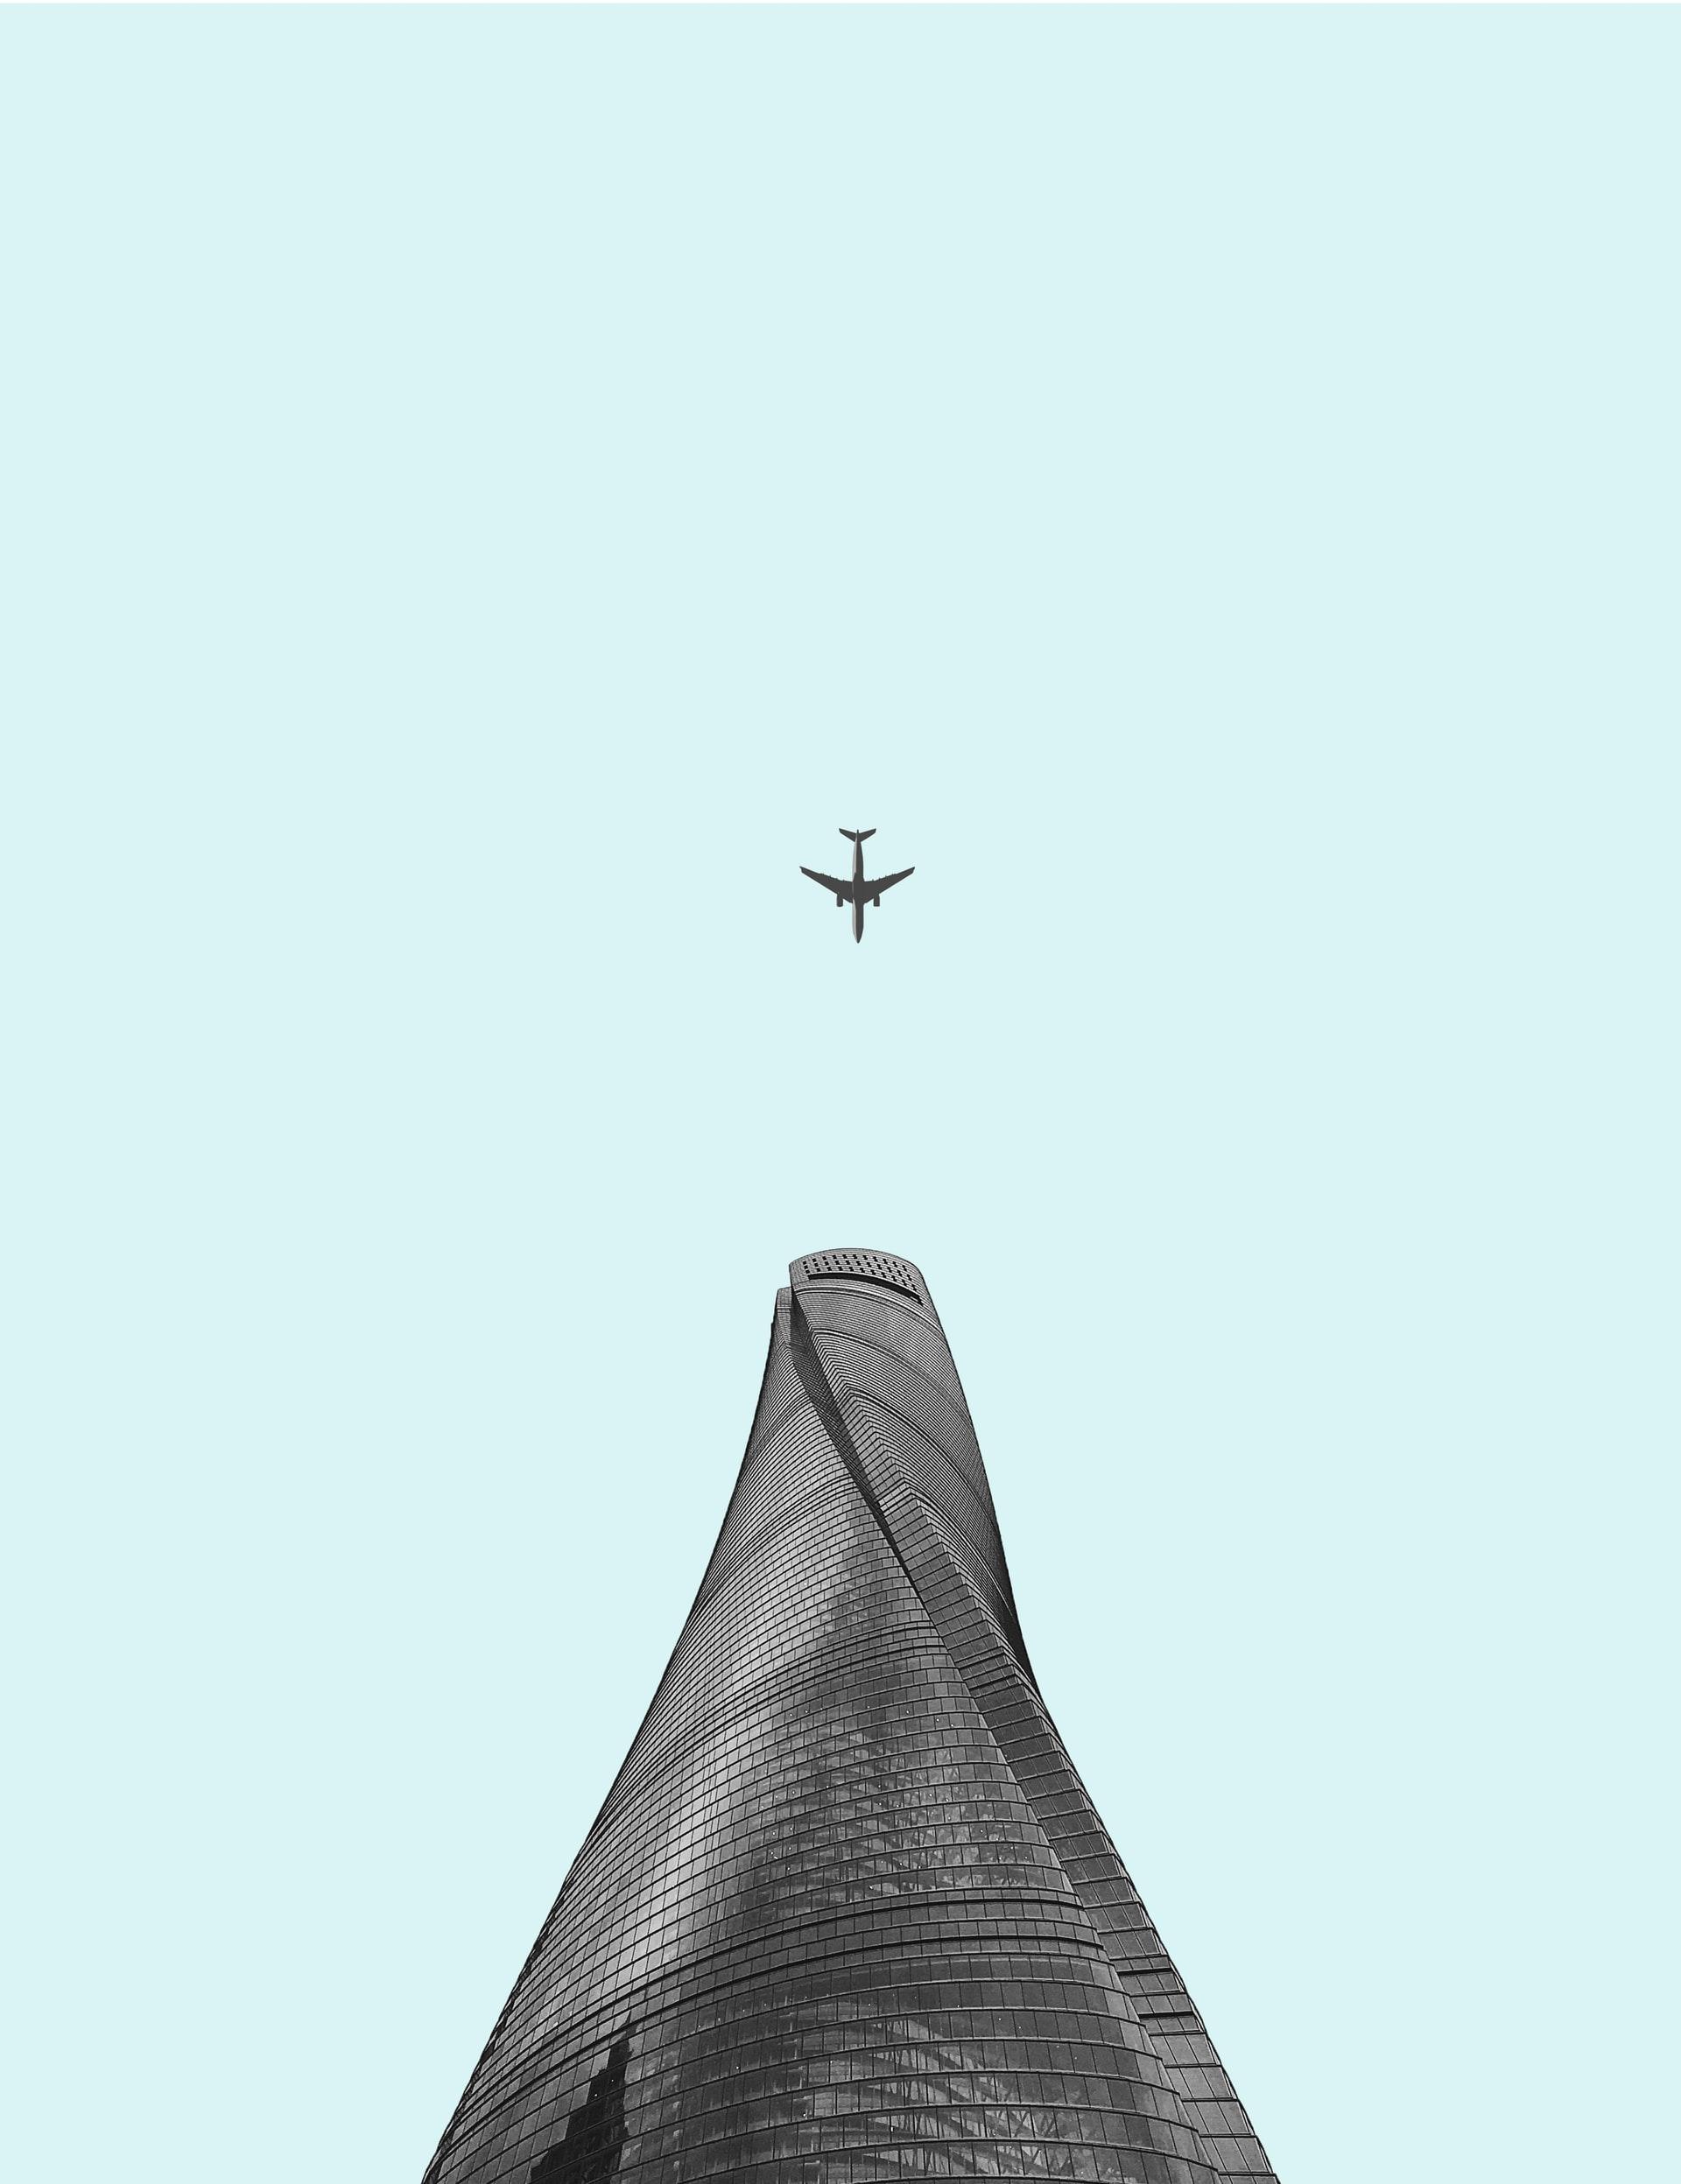 Shanghai Tower - Max Ostrozhinskiy